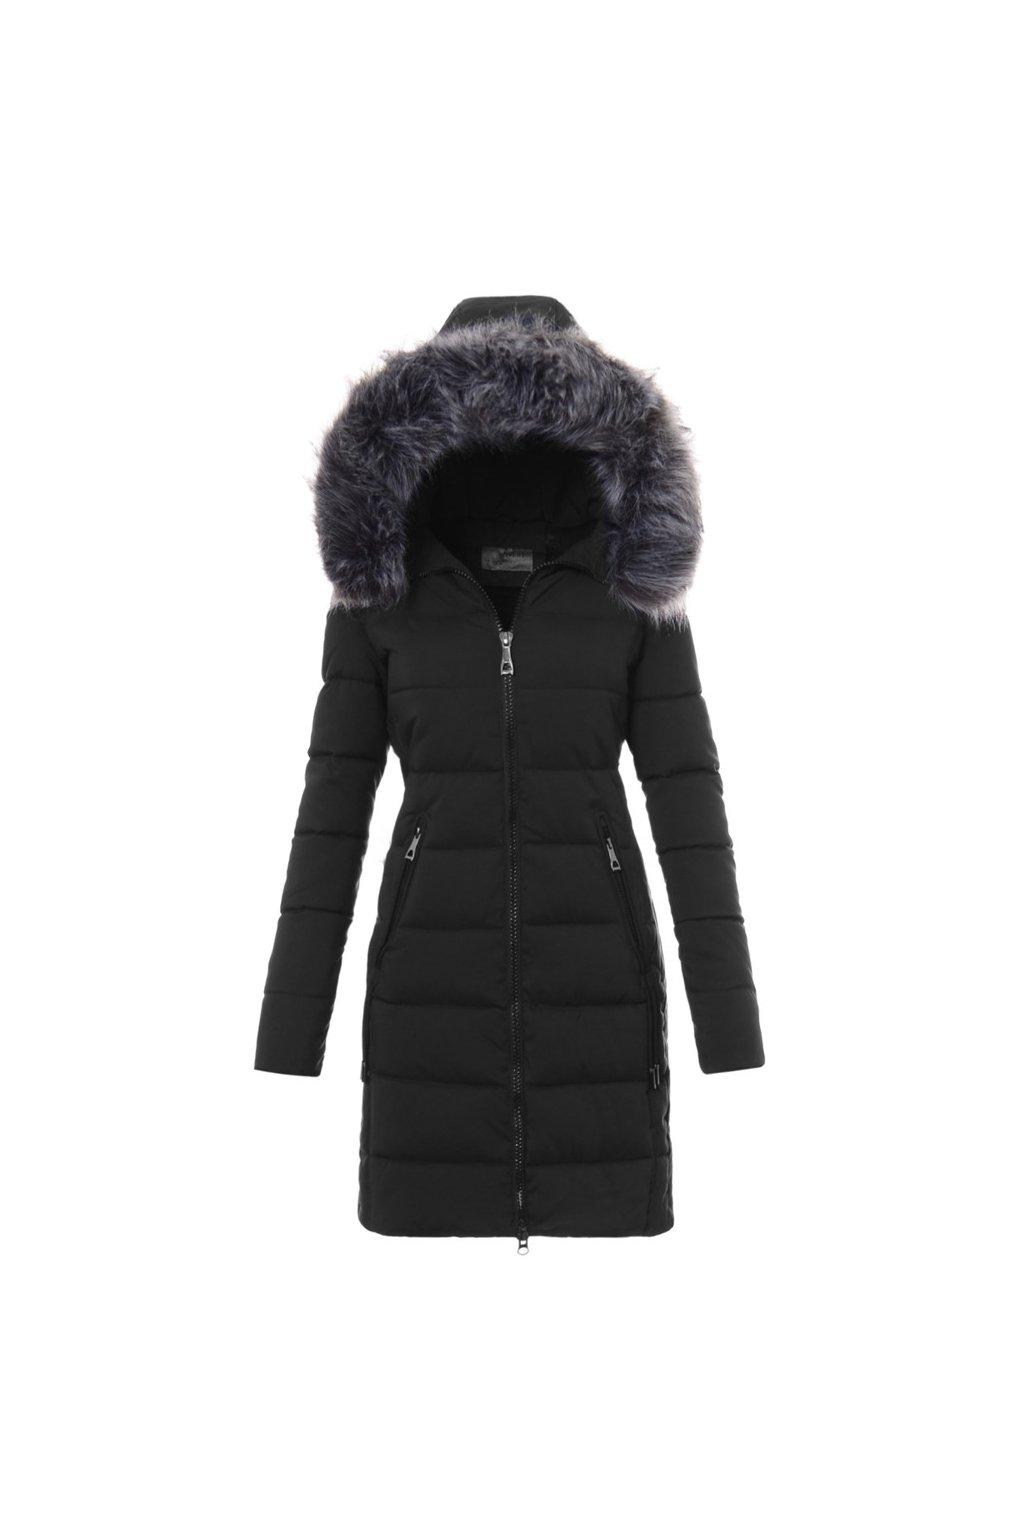 Dámska dlhá zimná bunda s kapucňou 3476 čierna